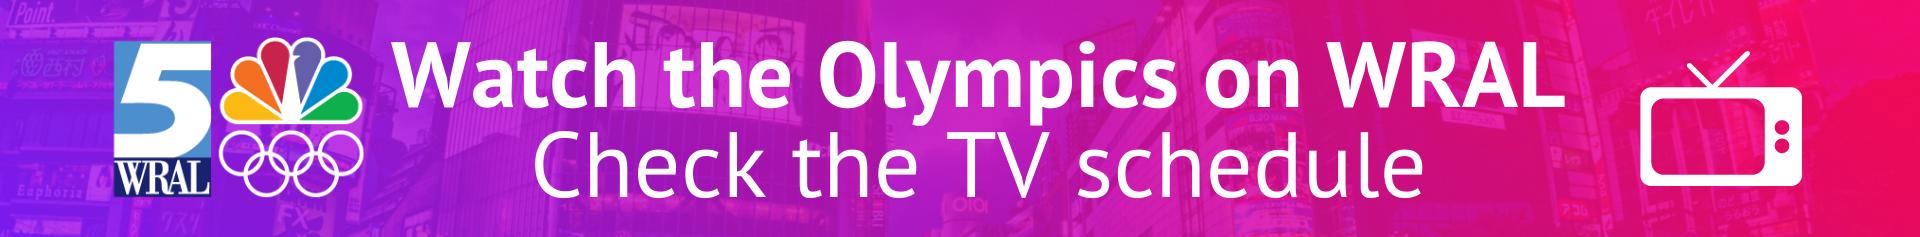 Olympics TV Schedule Promo